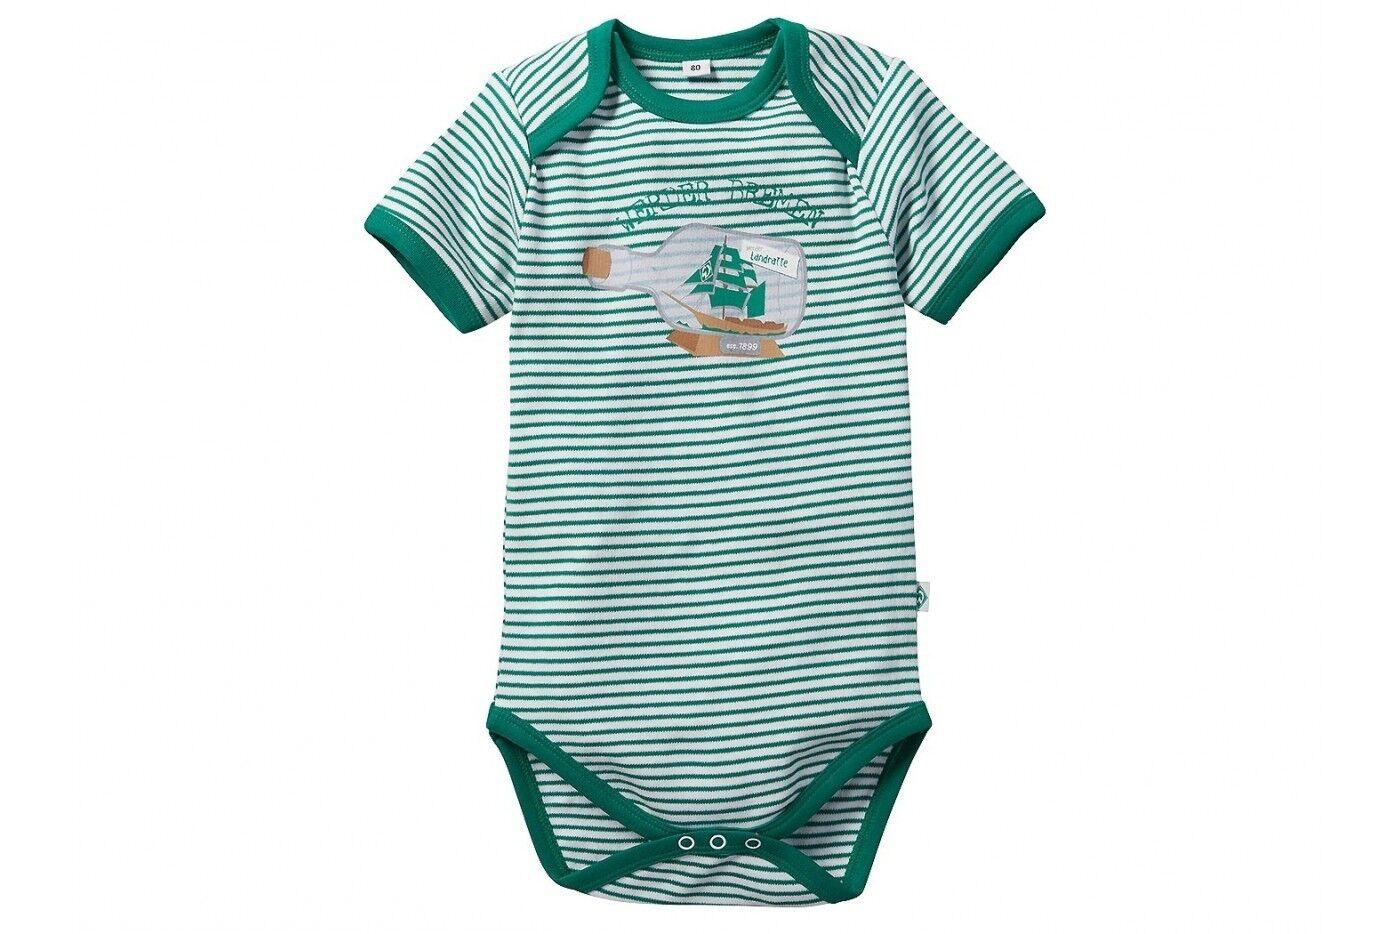 56-80 Werder Bremen SV GOTS Baby Baggy-Pant Gr